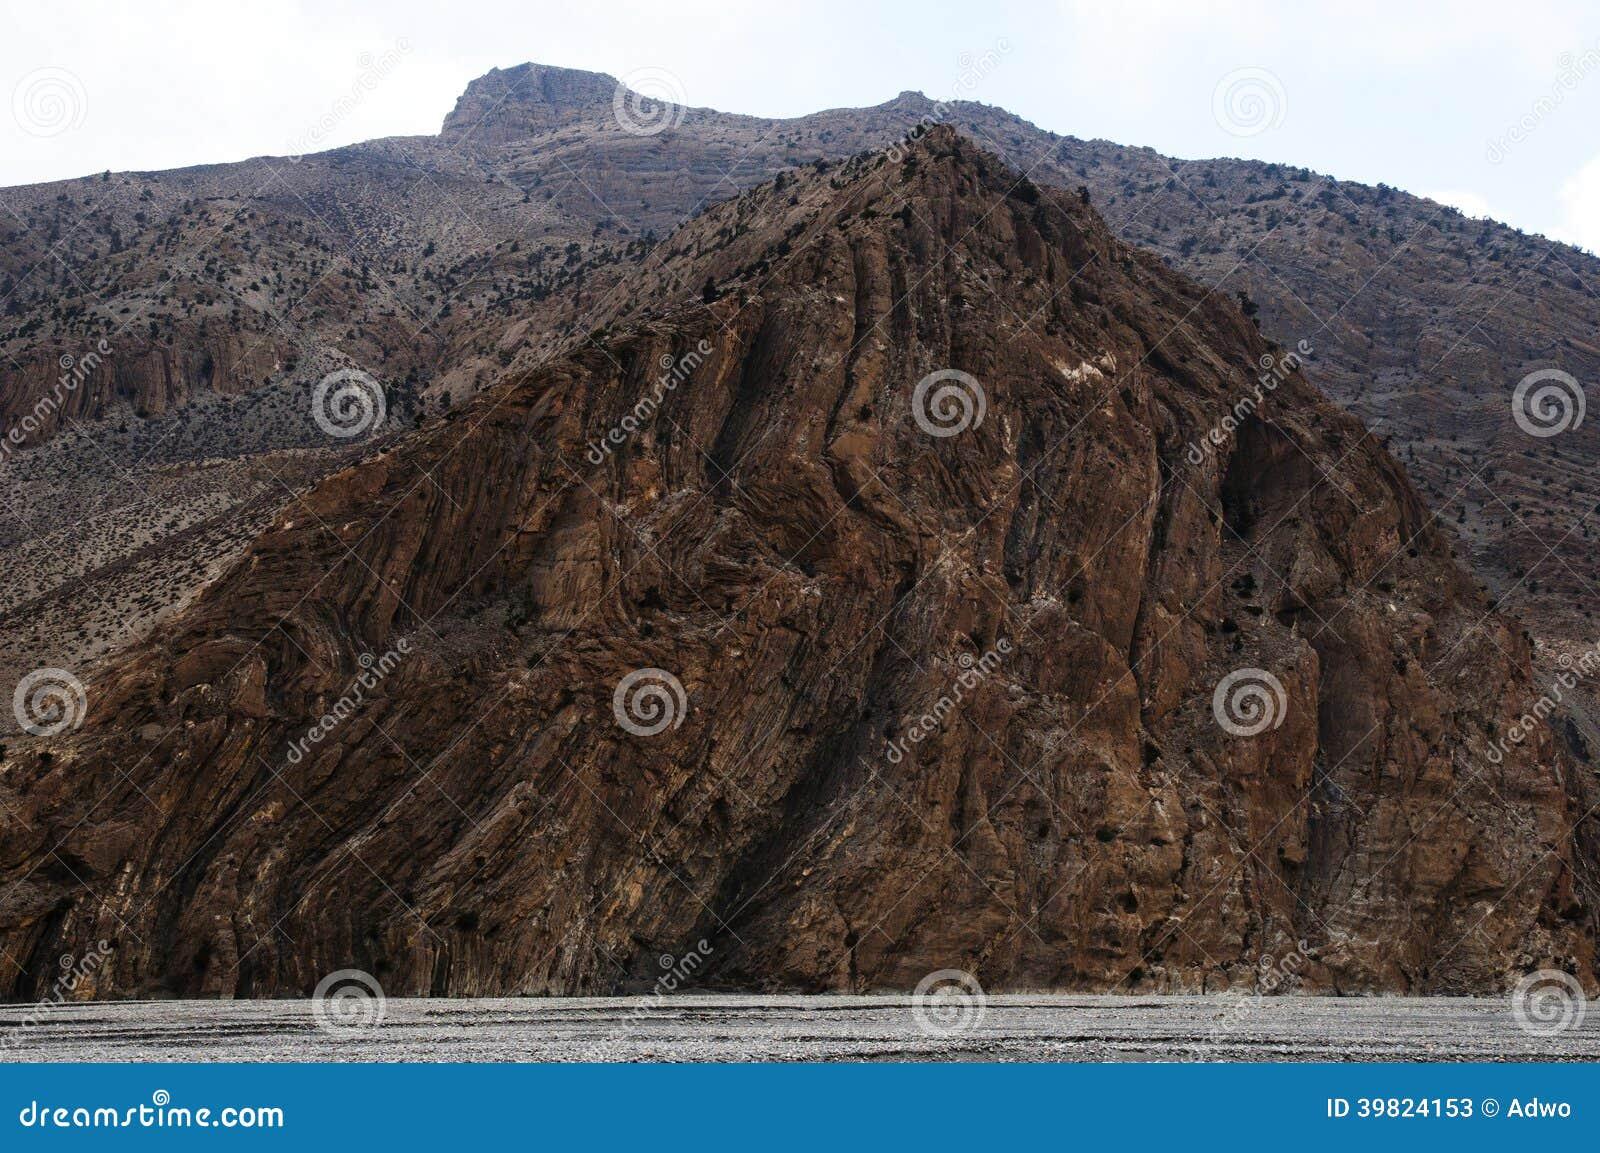 Pliage malléable - géologie